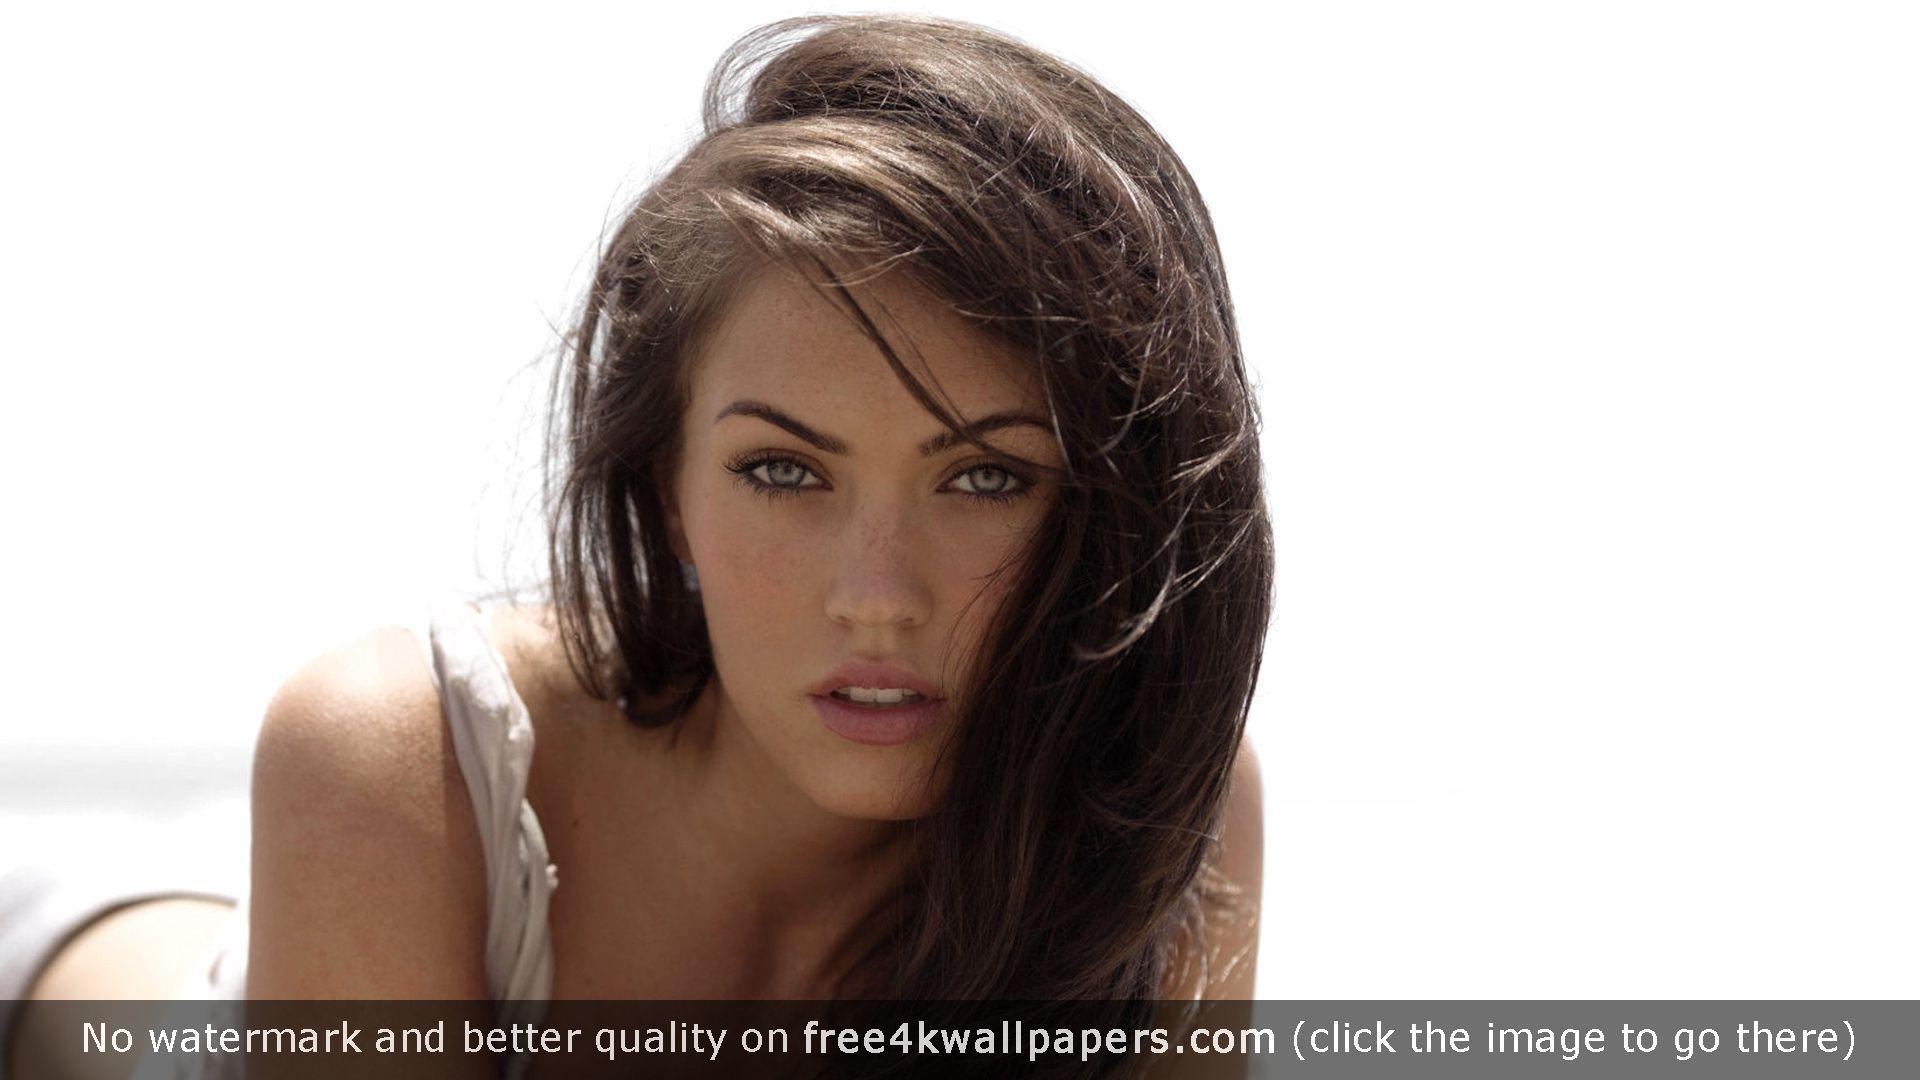 hd 1080p girls hot free downloads wallpaper | desktop wallpapers